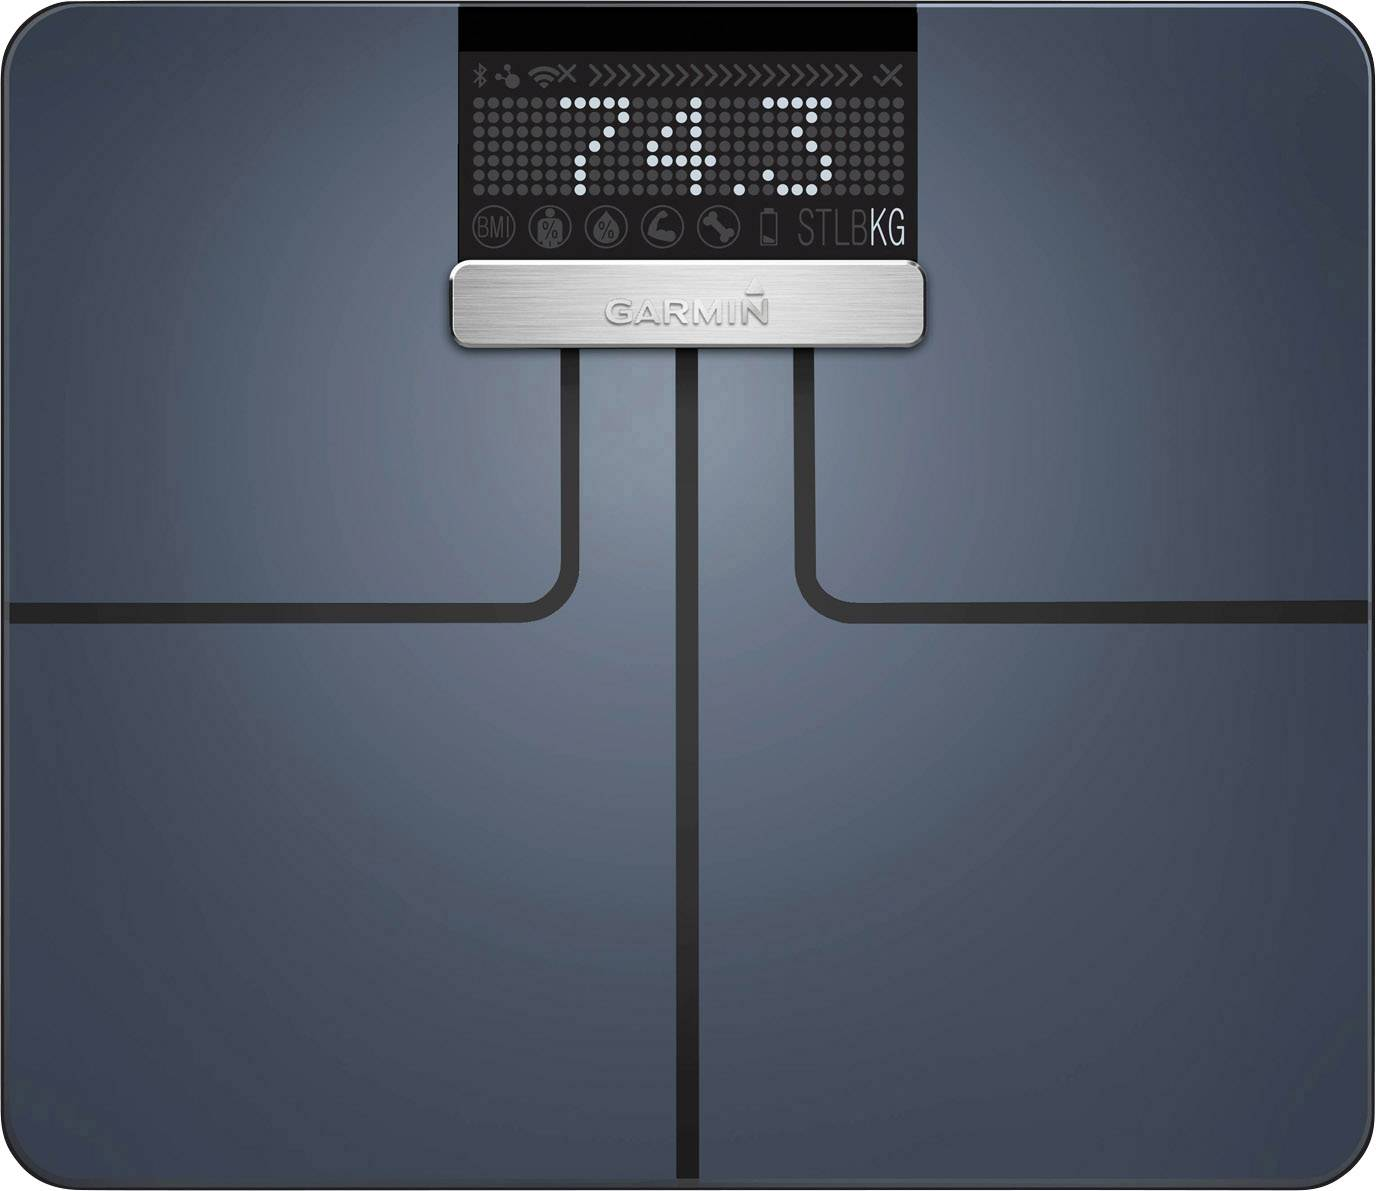 Analyzačná váha Garmin Index™-Smart-Waage, čierna